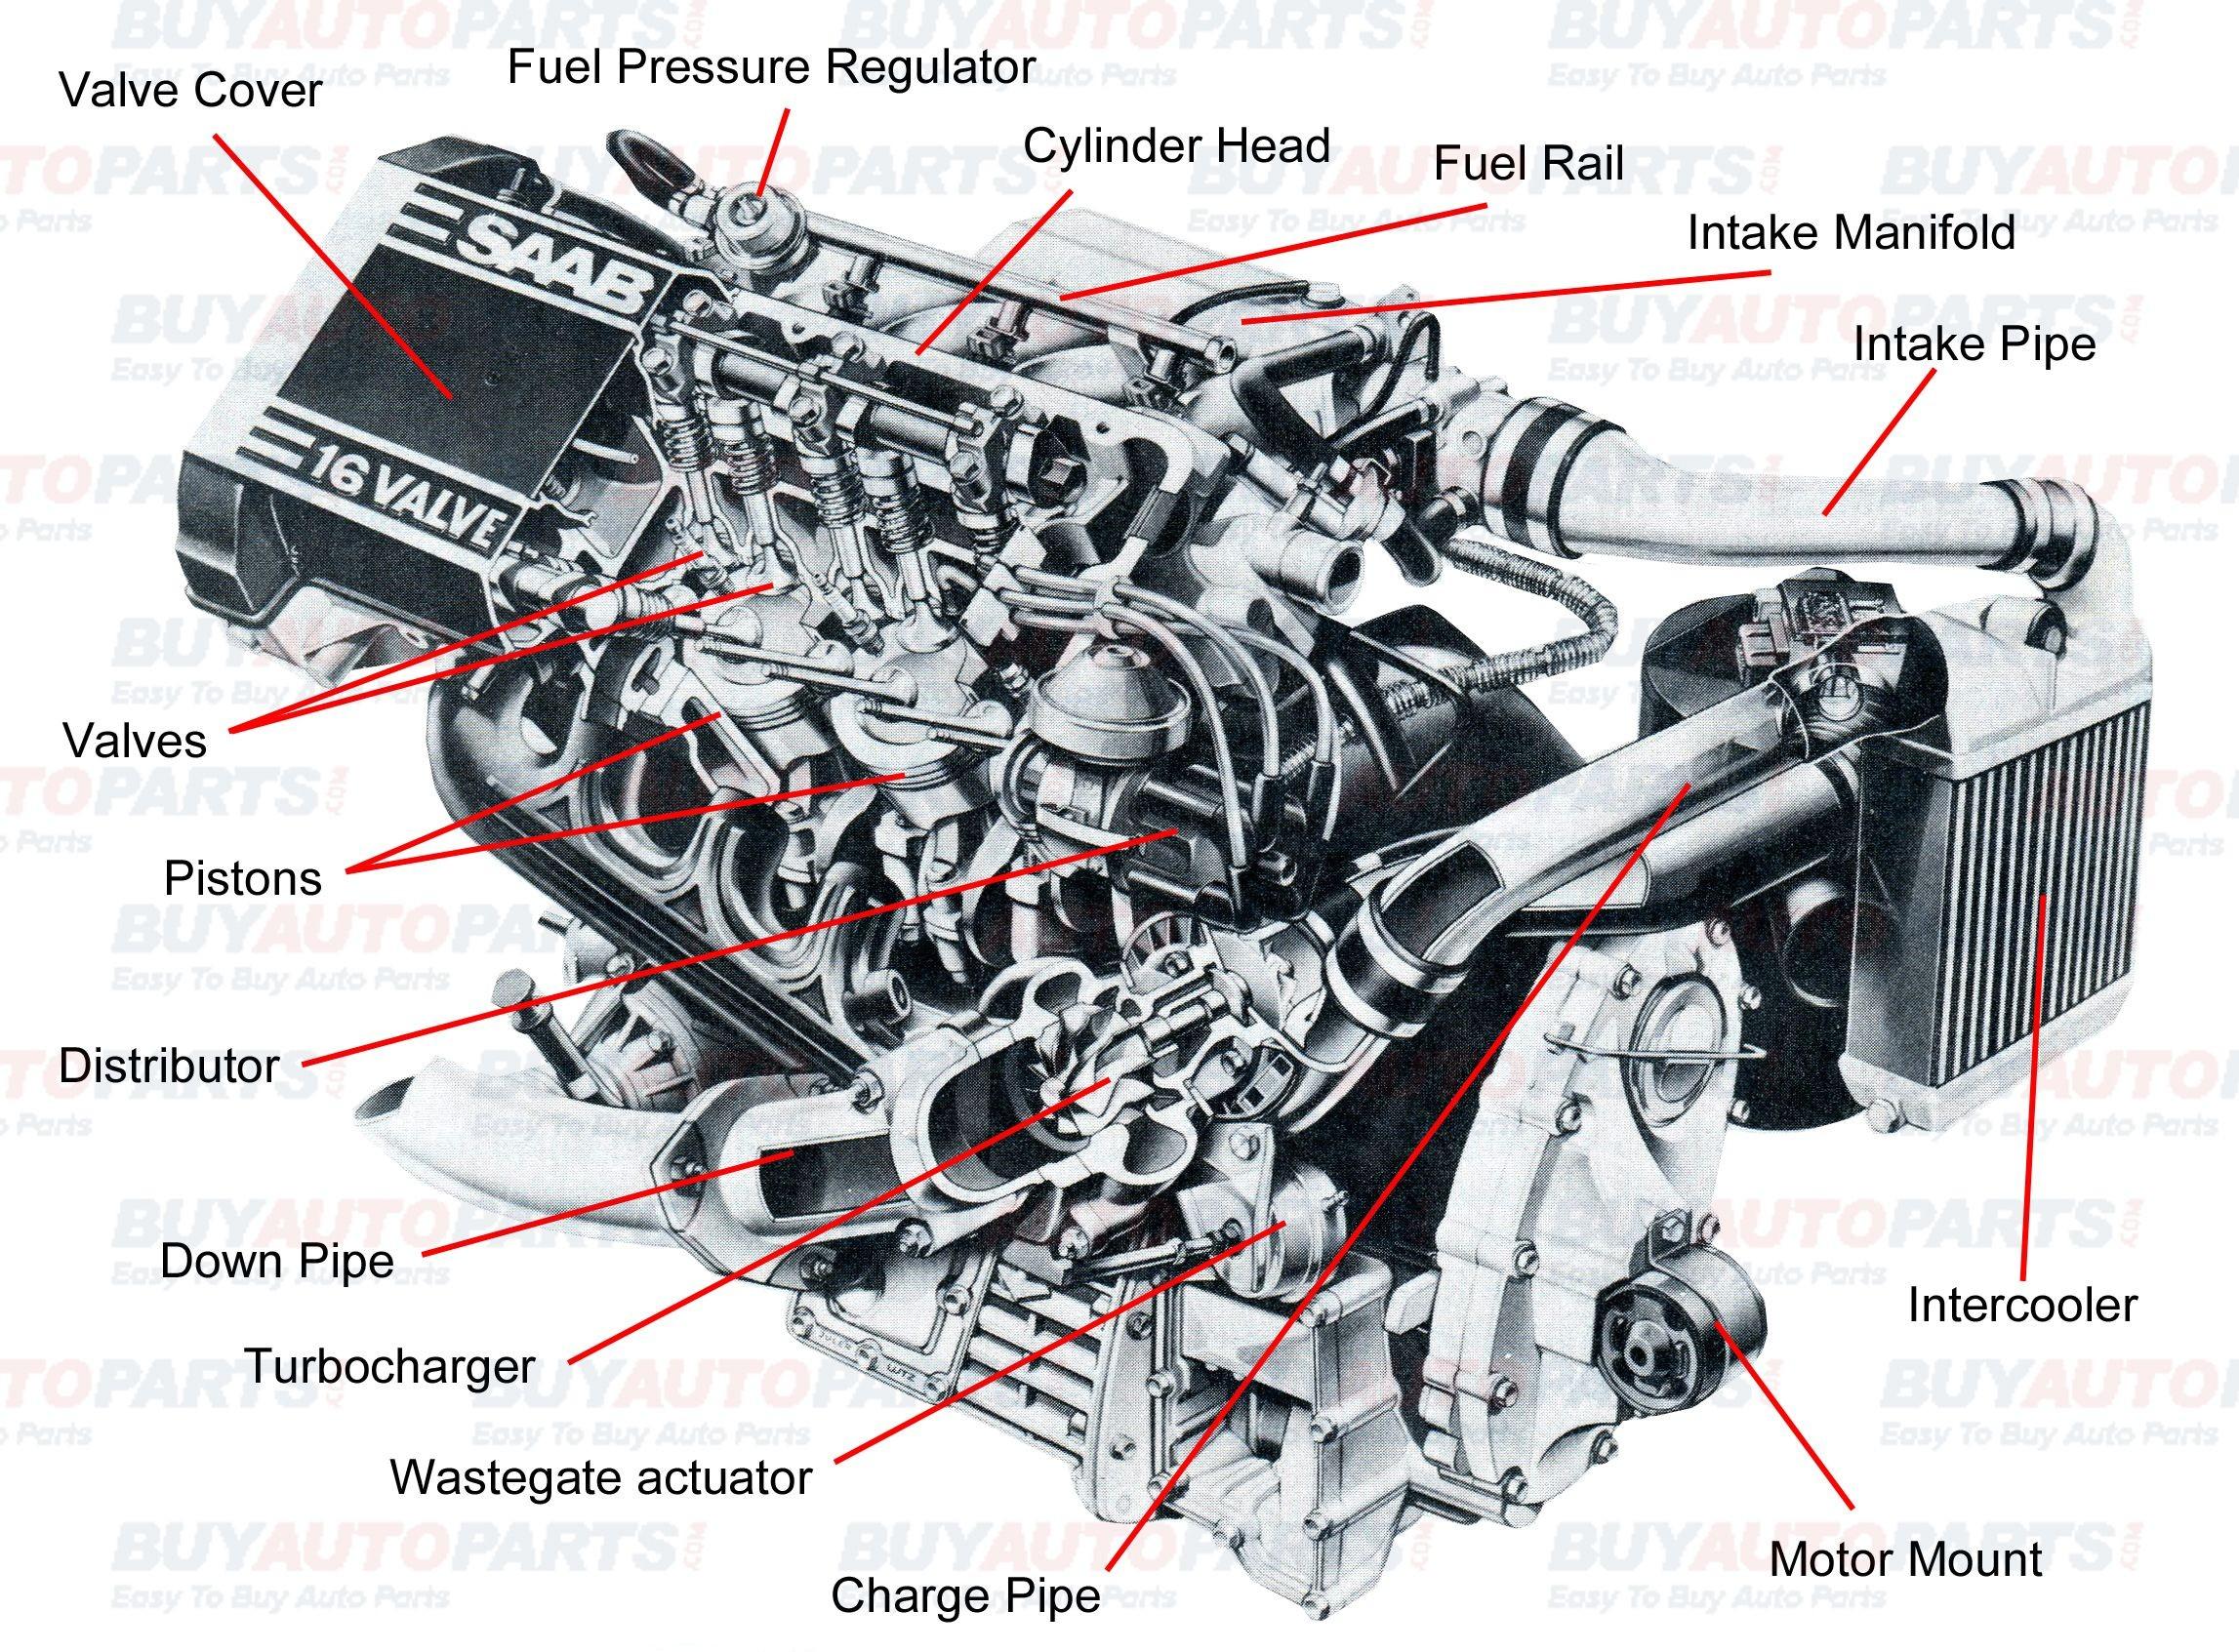 Single Cylinder Motorcycle Engine Diagram All Internal Bustion Engines Have the Same Basic Ponents the Of Single Cylinder Motorcycle Engine Diagram